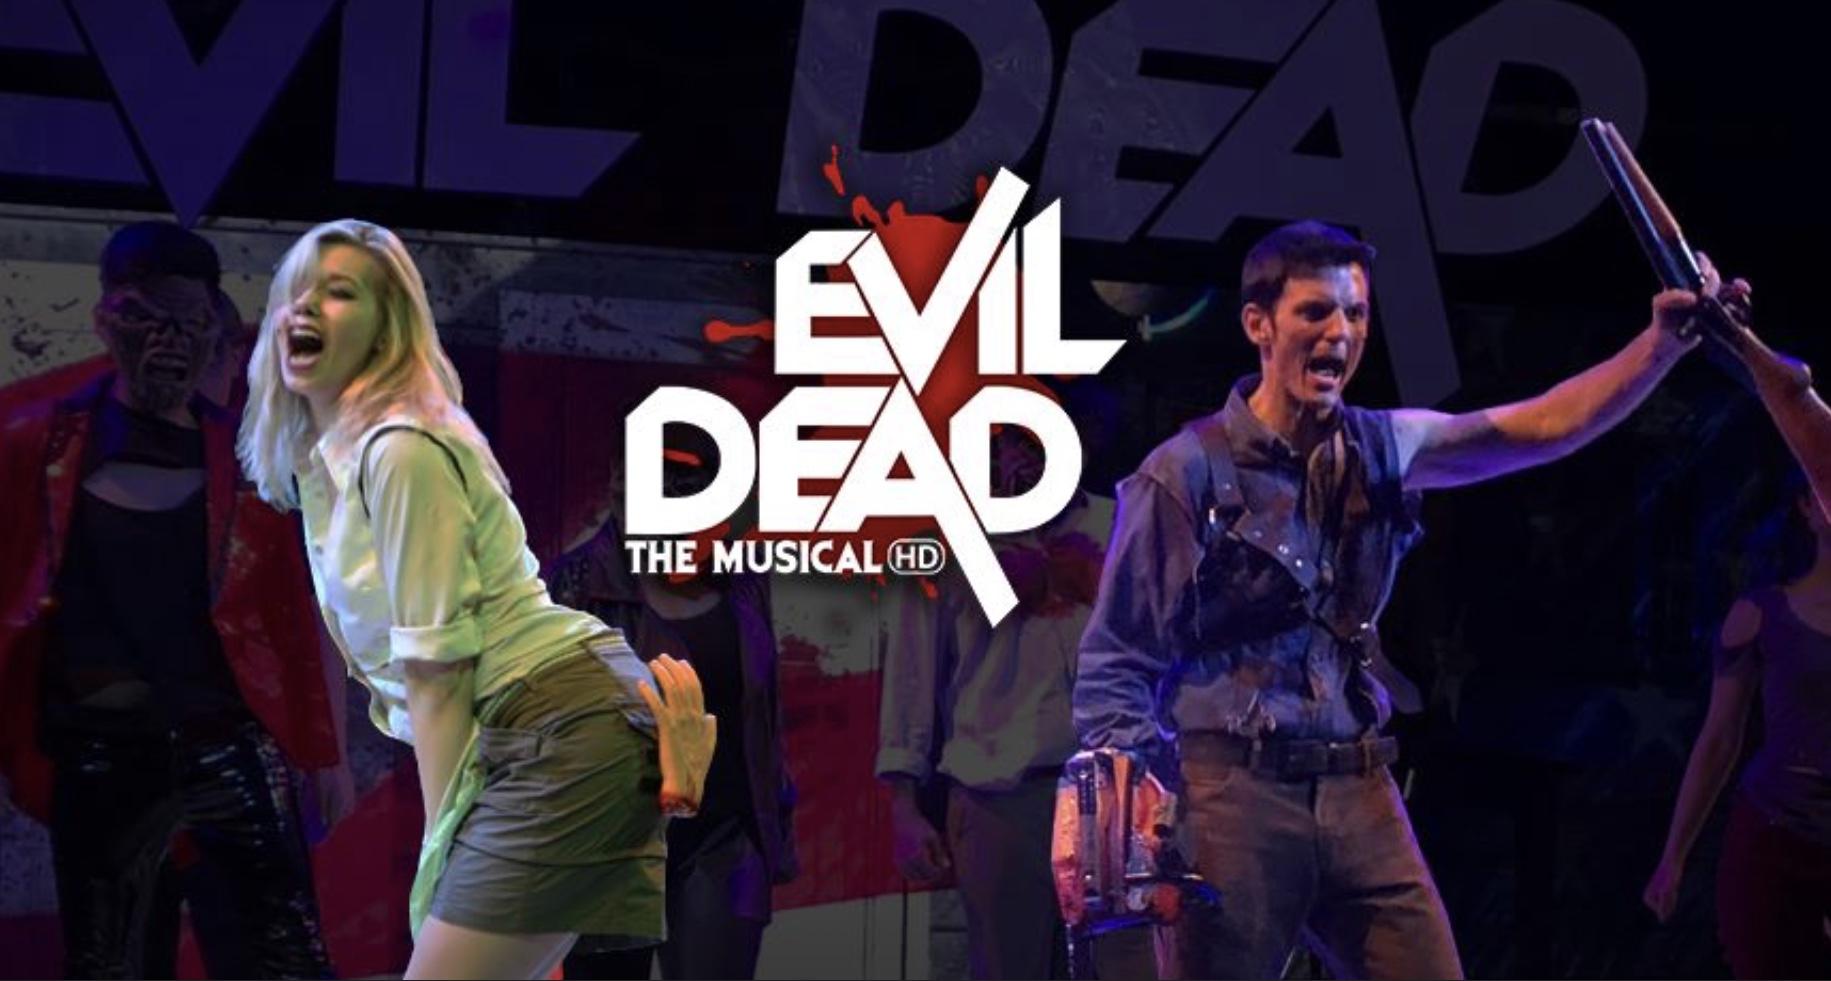 Evil-Dead-HD-boomstick